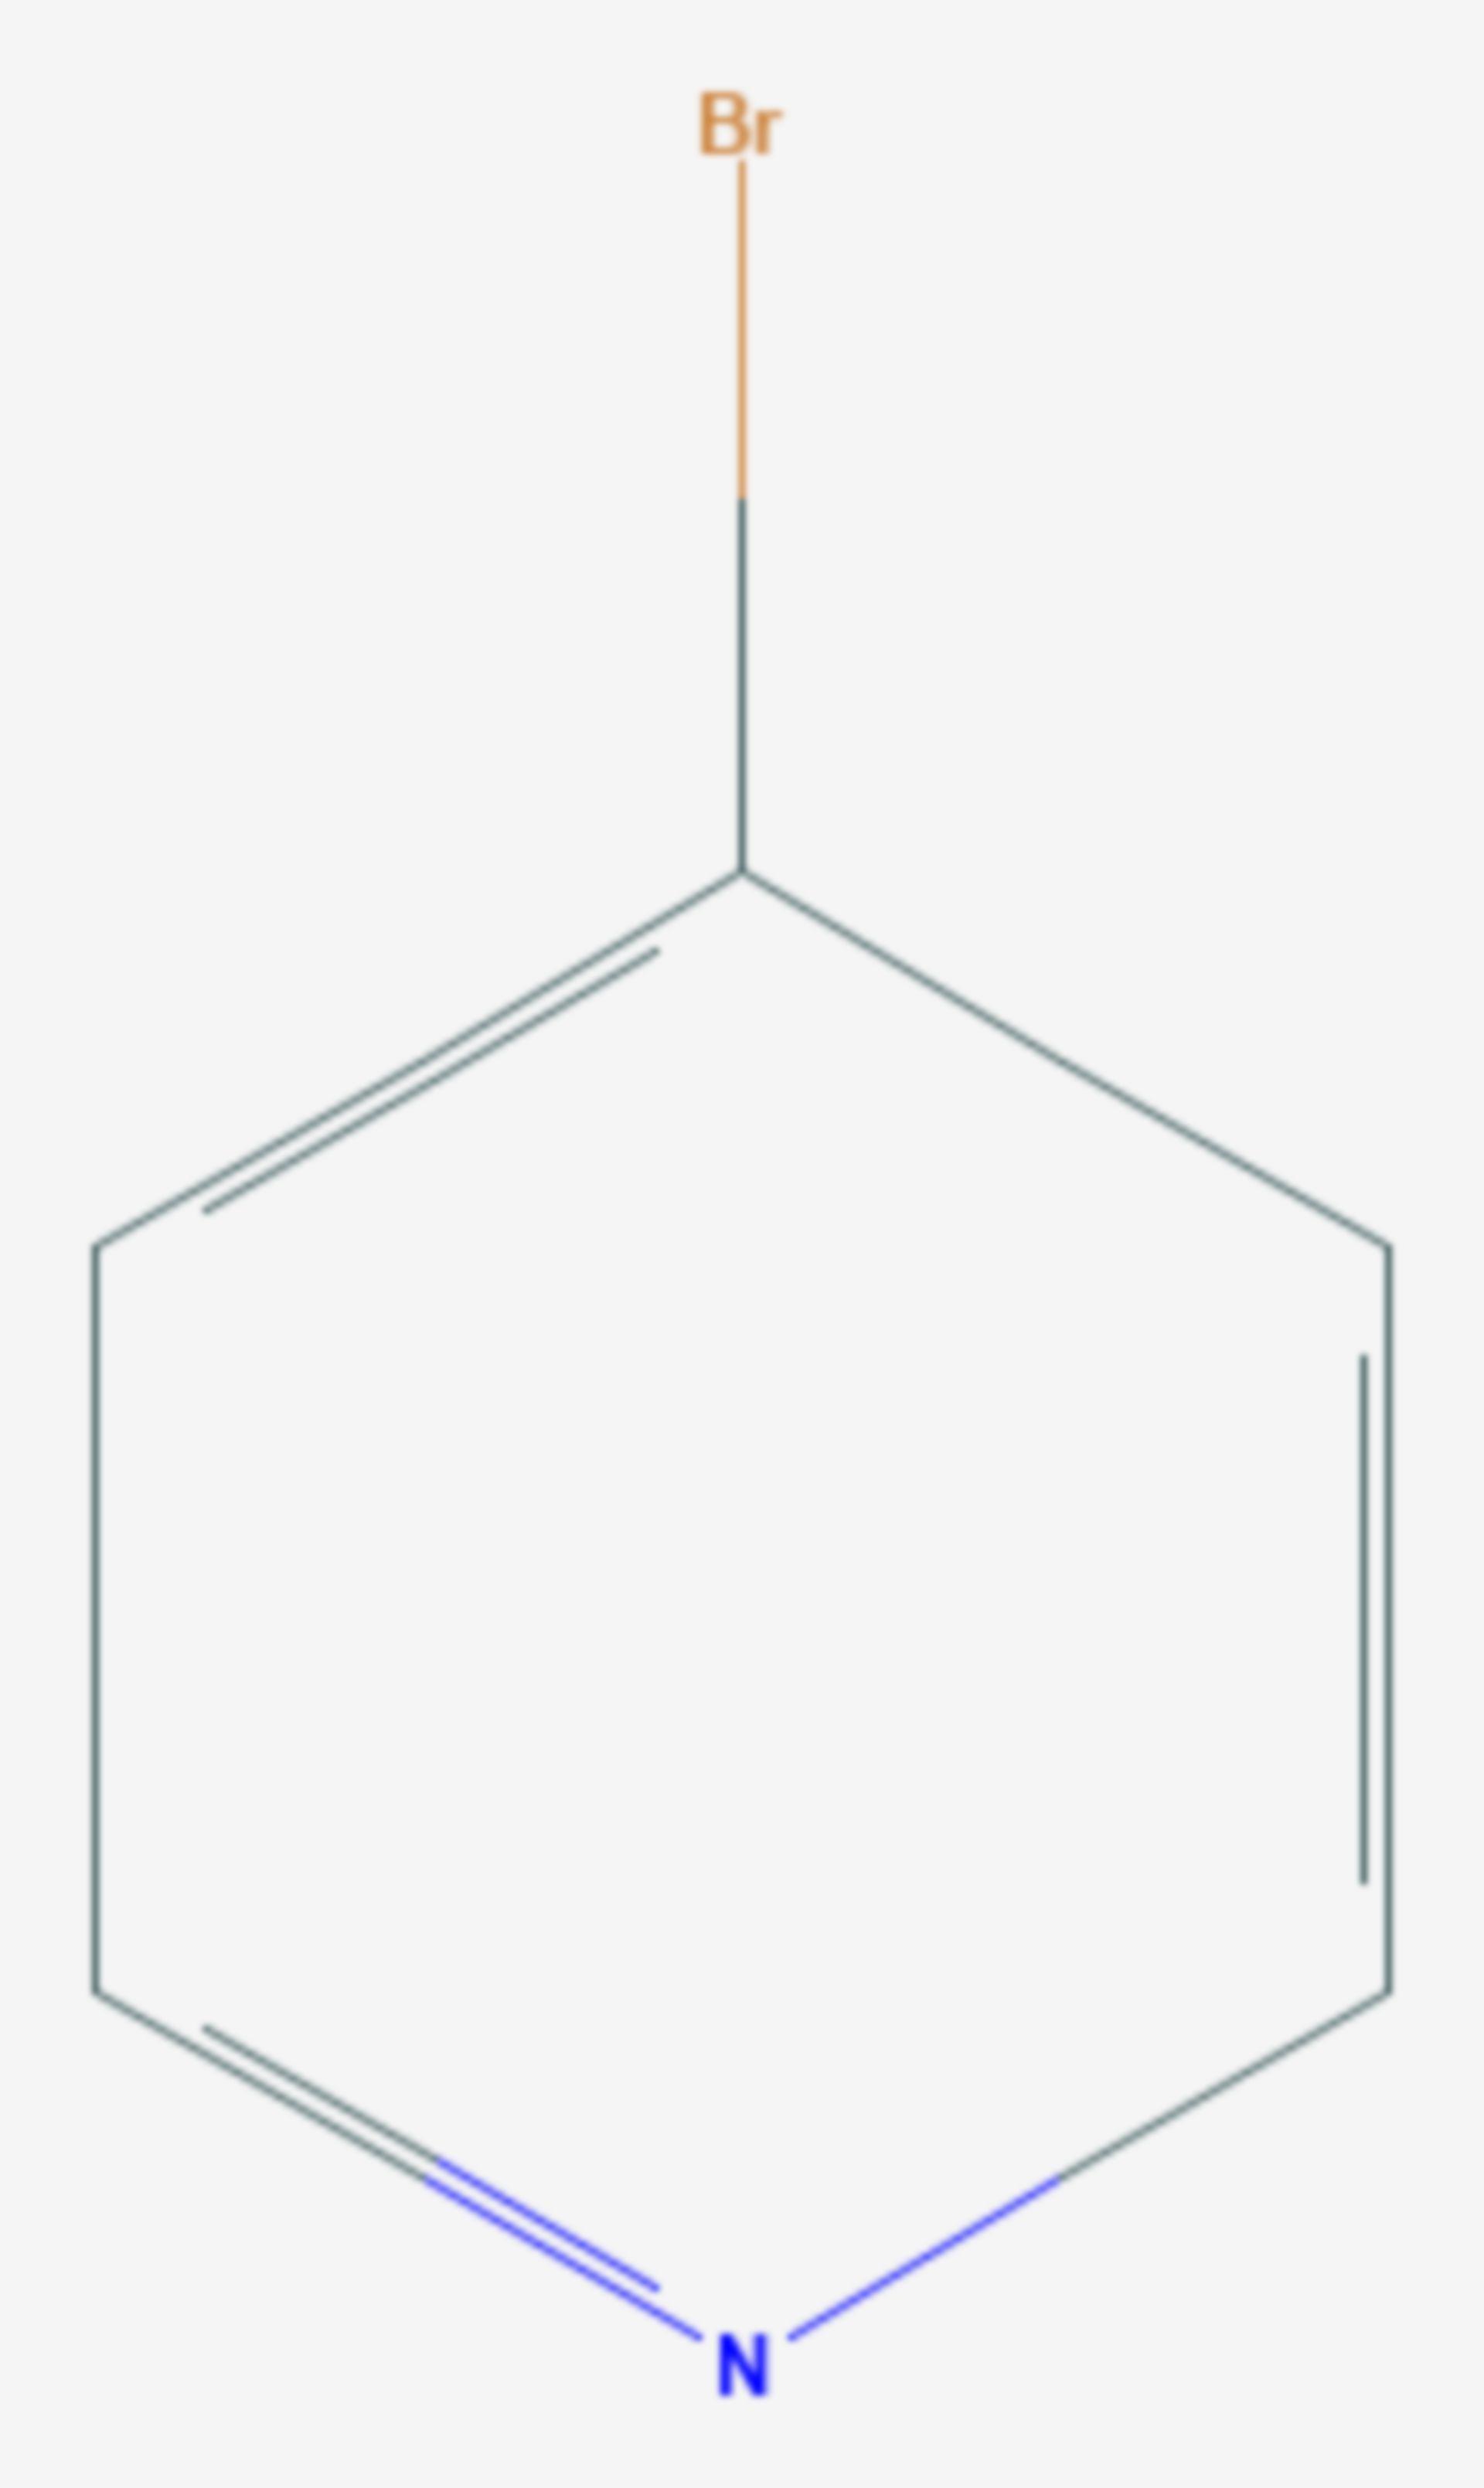 4-Brompyridin (Strukturformel)